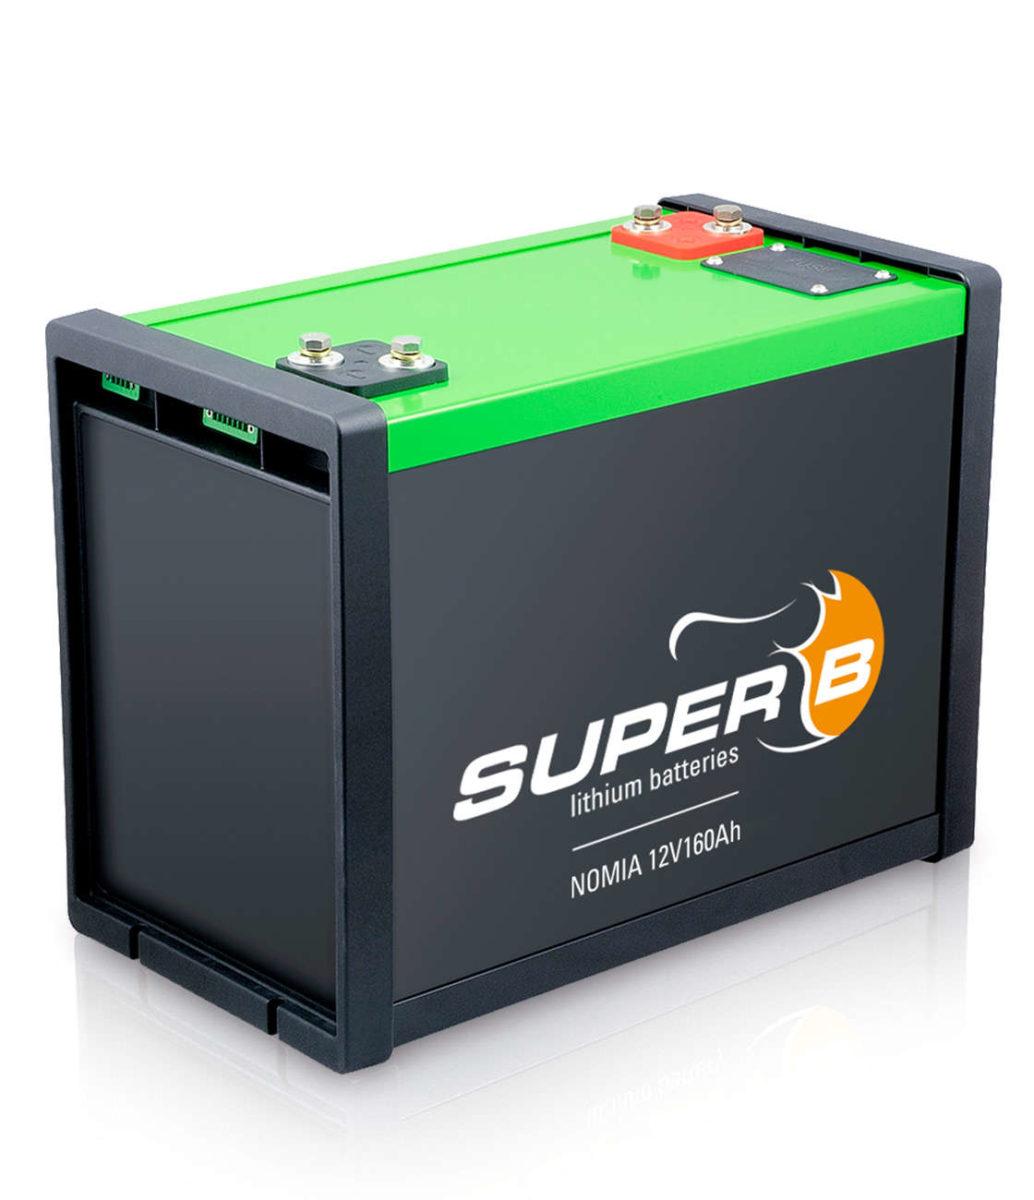 Lithium Batterie Super B 12V 160Ah 3